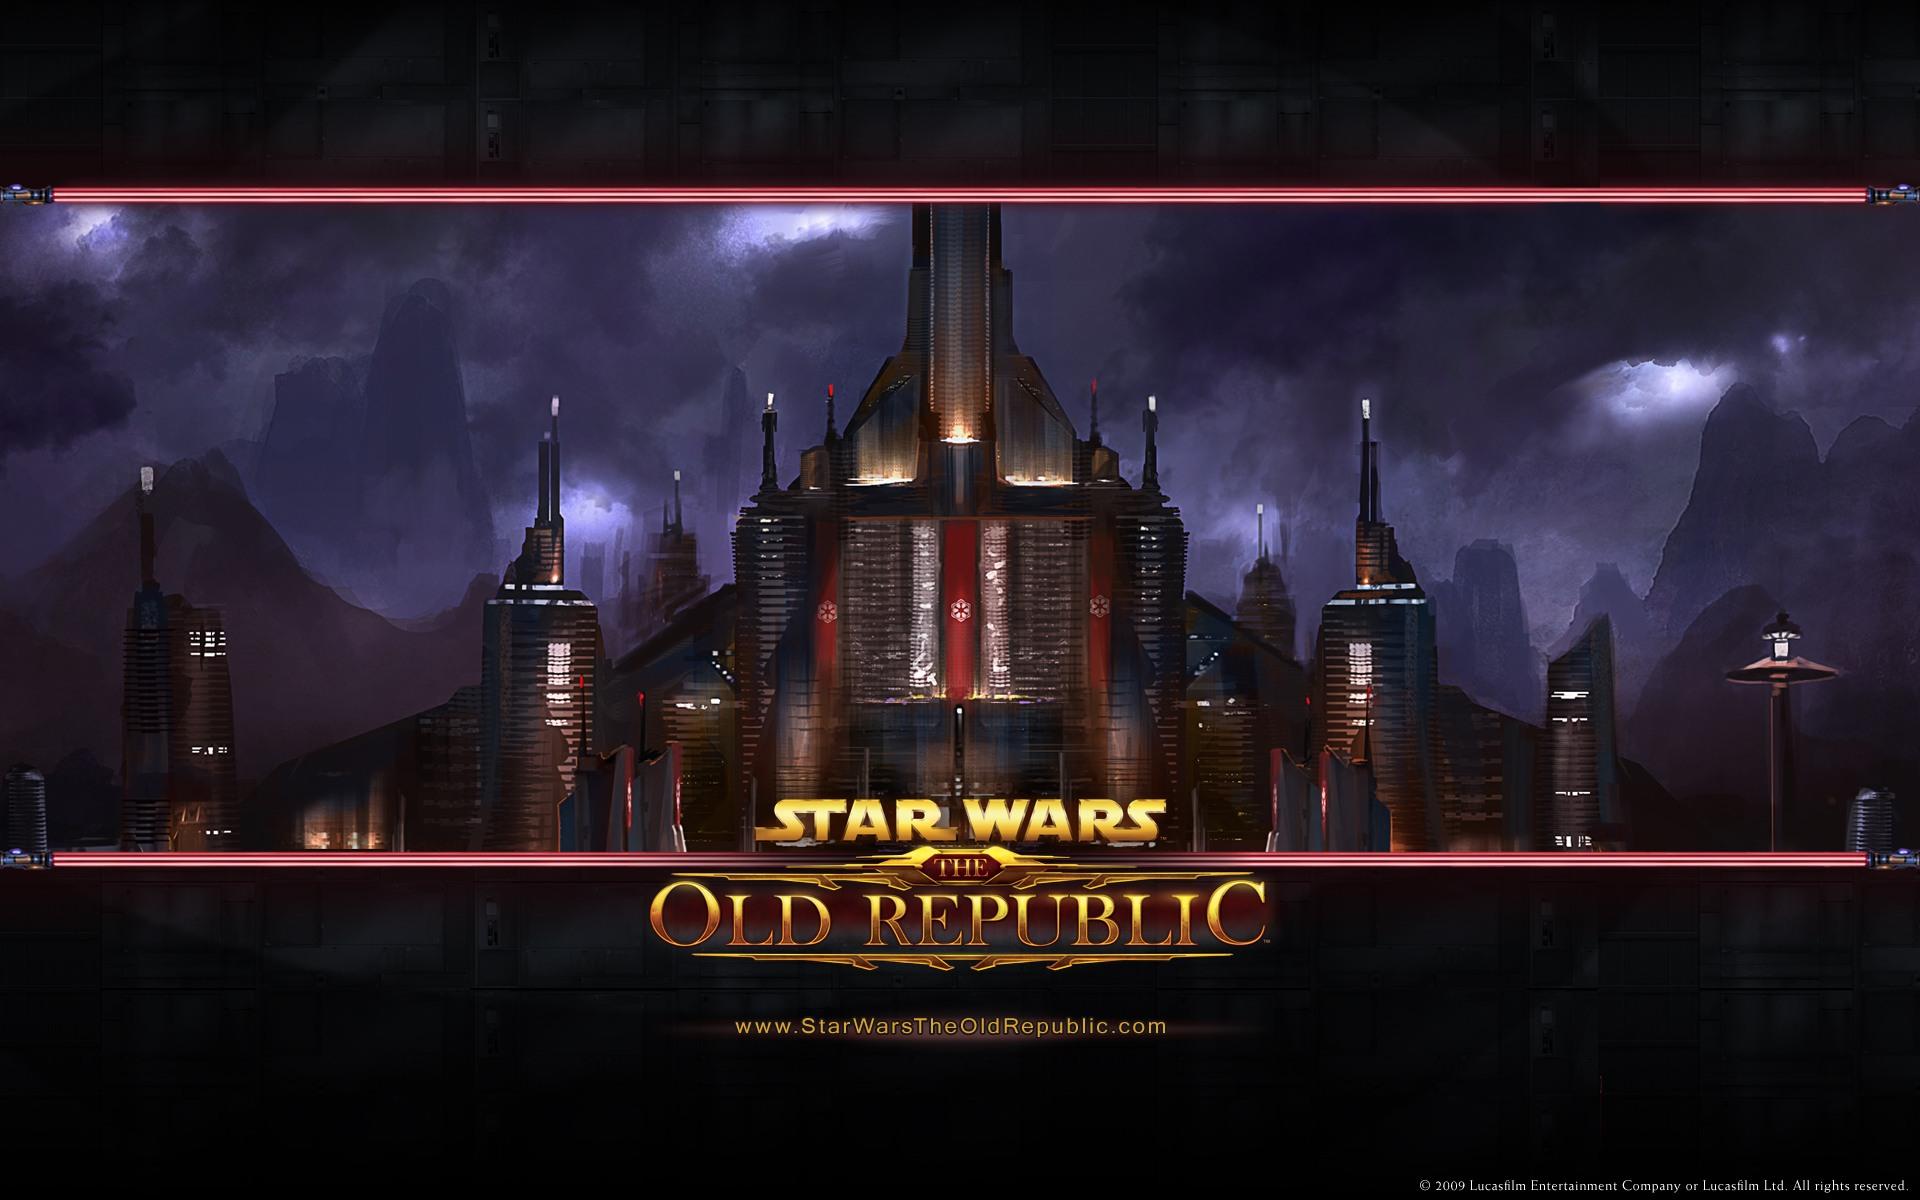 Star Wars The Old Republic desktop wallpaper 1920x1200